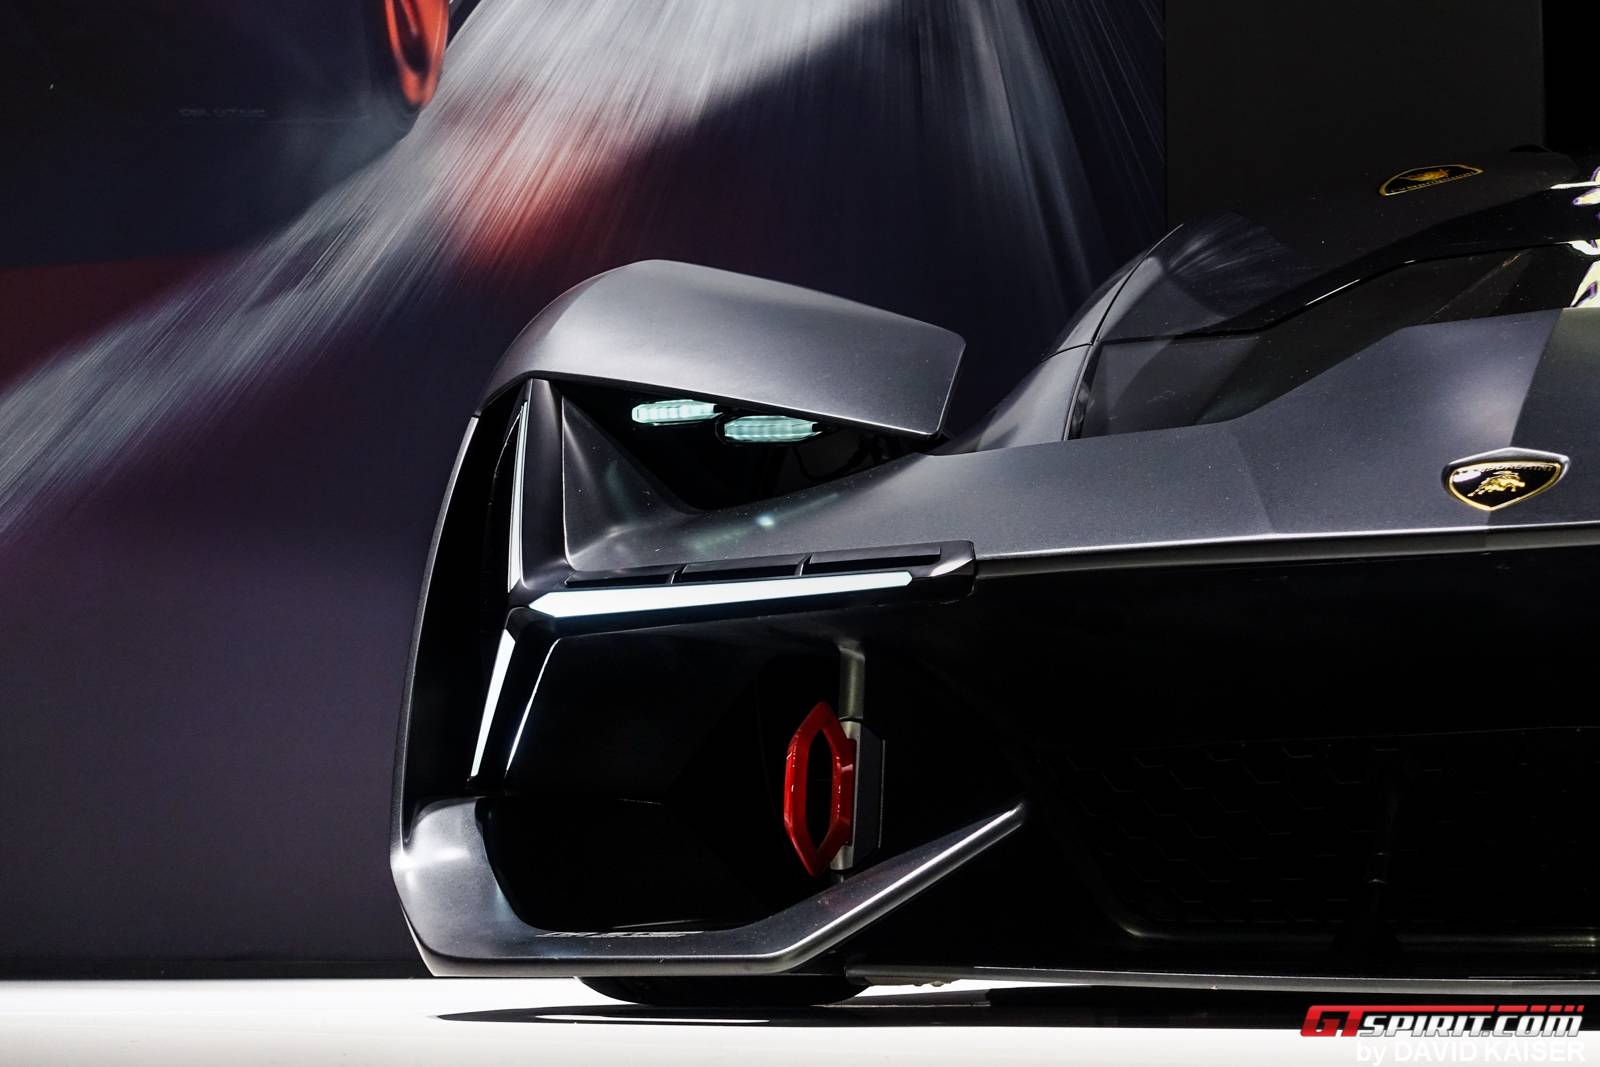 Lamborghini Lb48h Upcoming 2 5 Million Hybrid Supercar Previewed